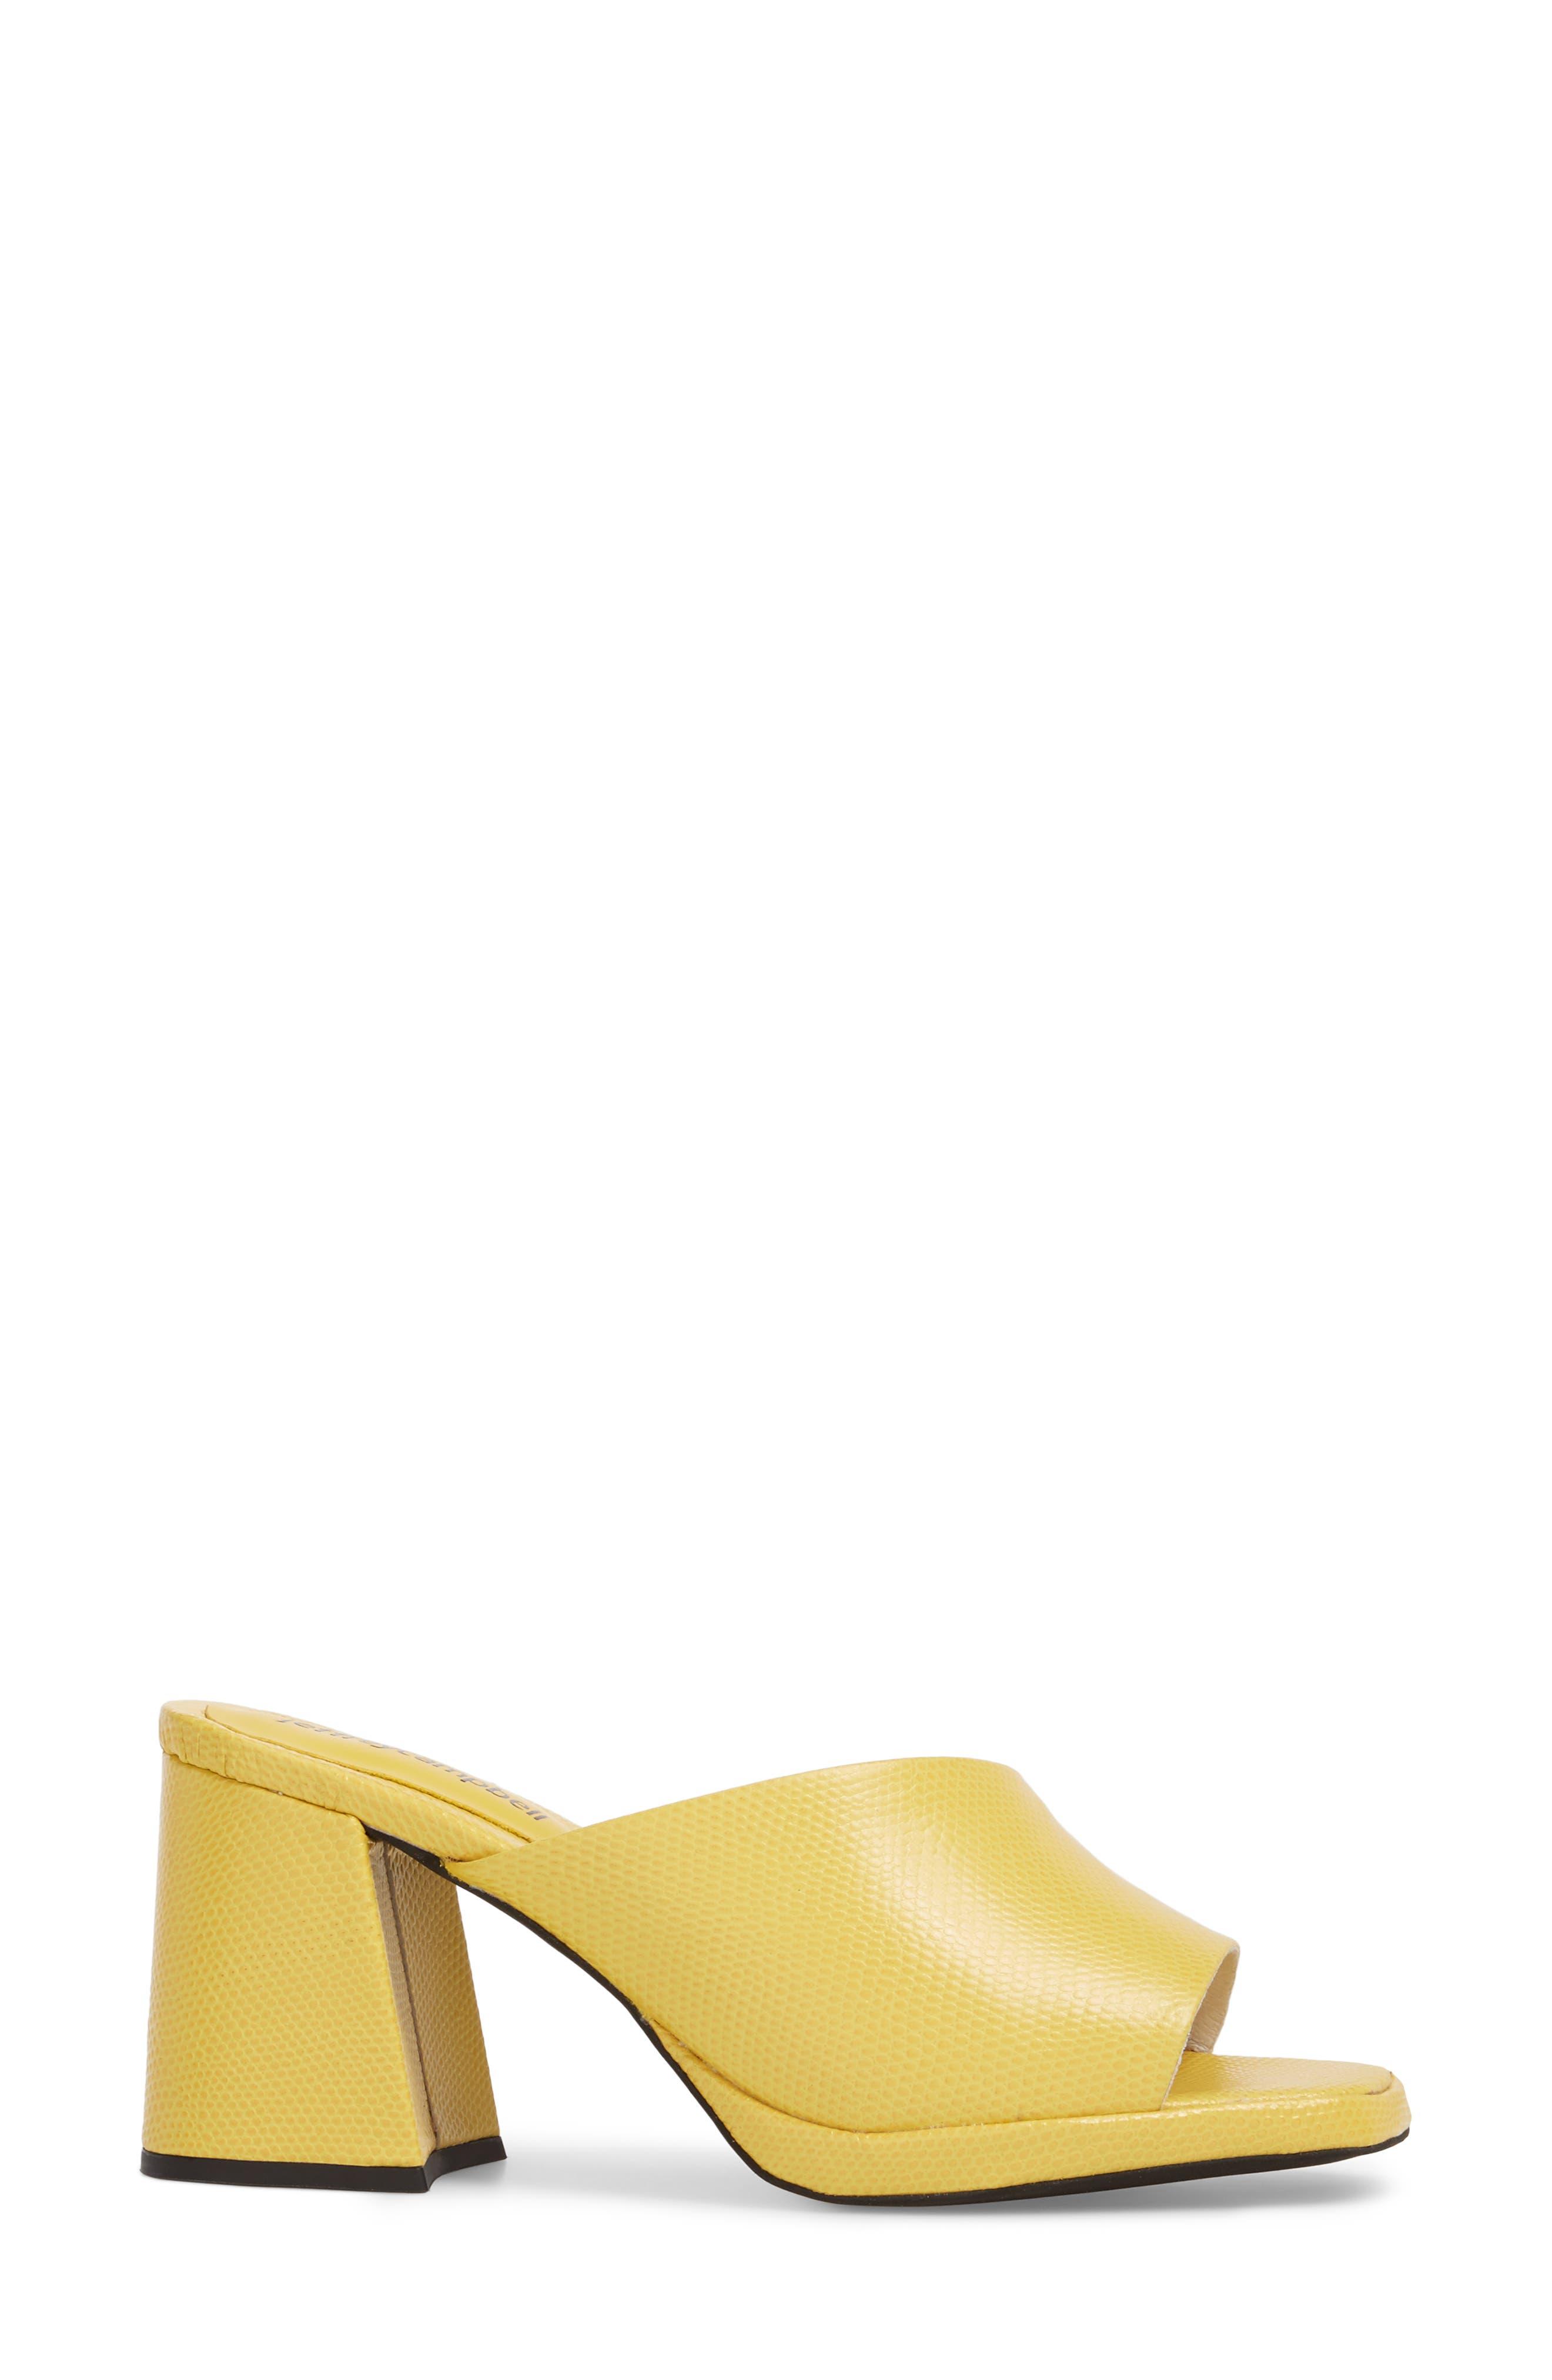 Suzuci Sandal,                             Alternate thumbnail 3, color,                             Yellow Leather